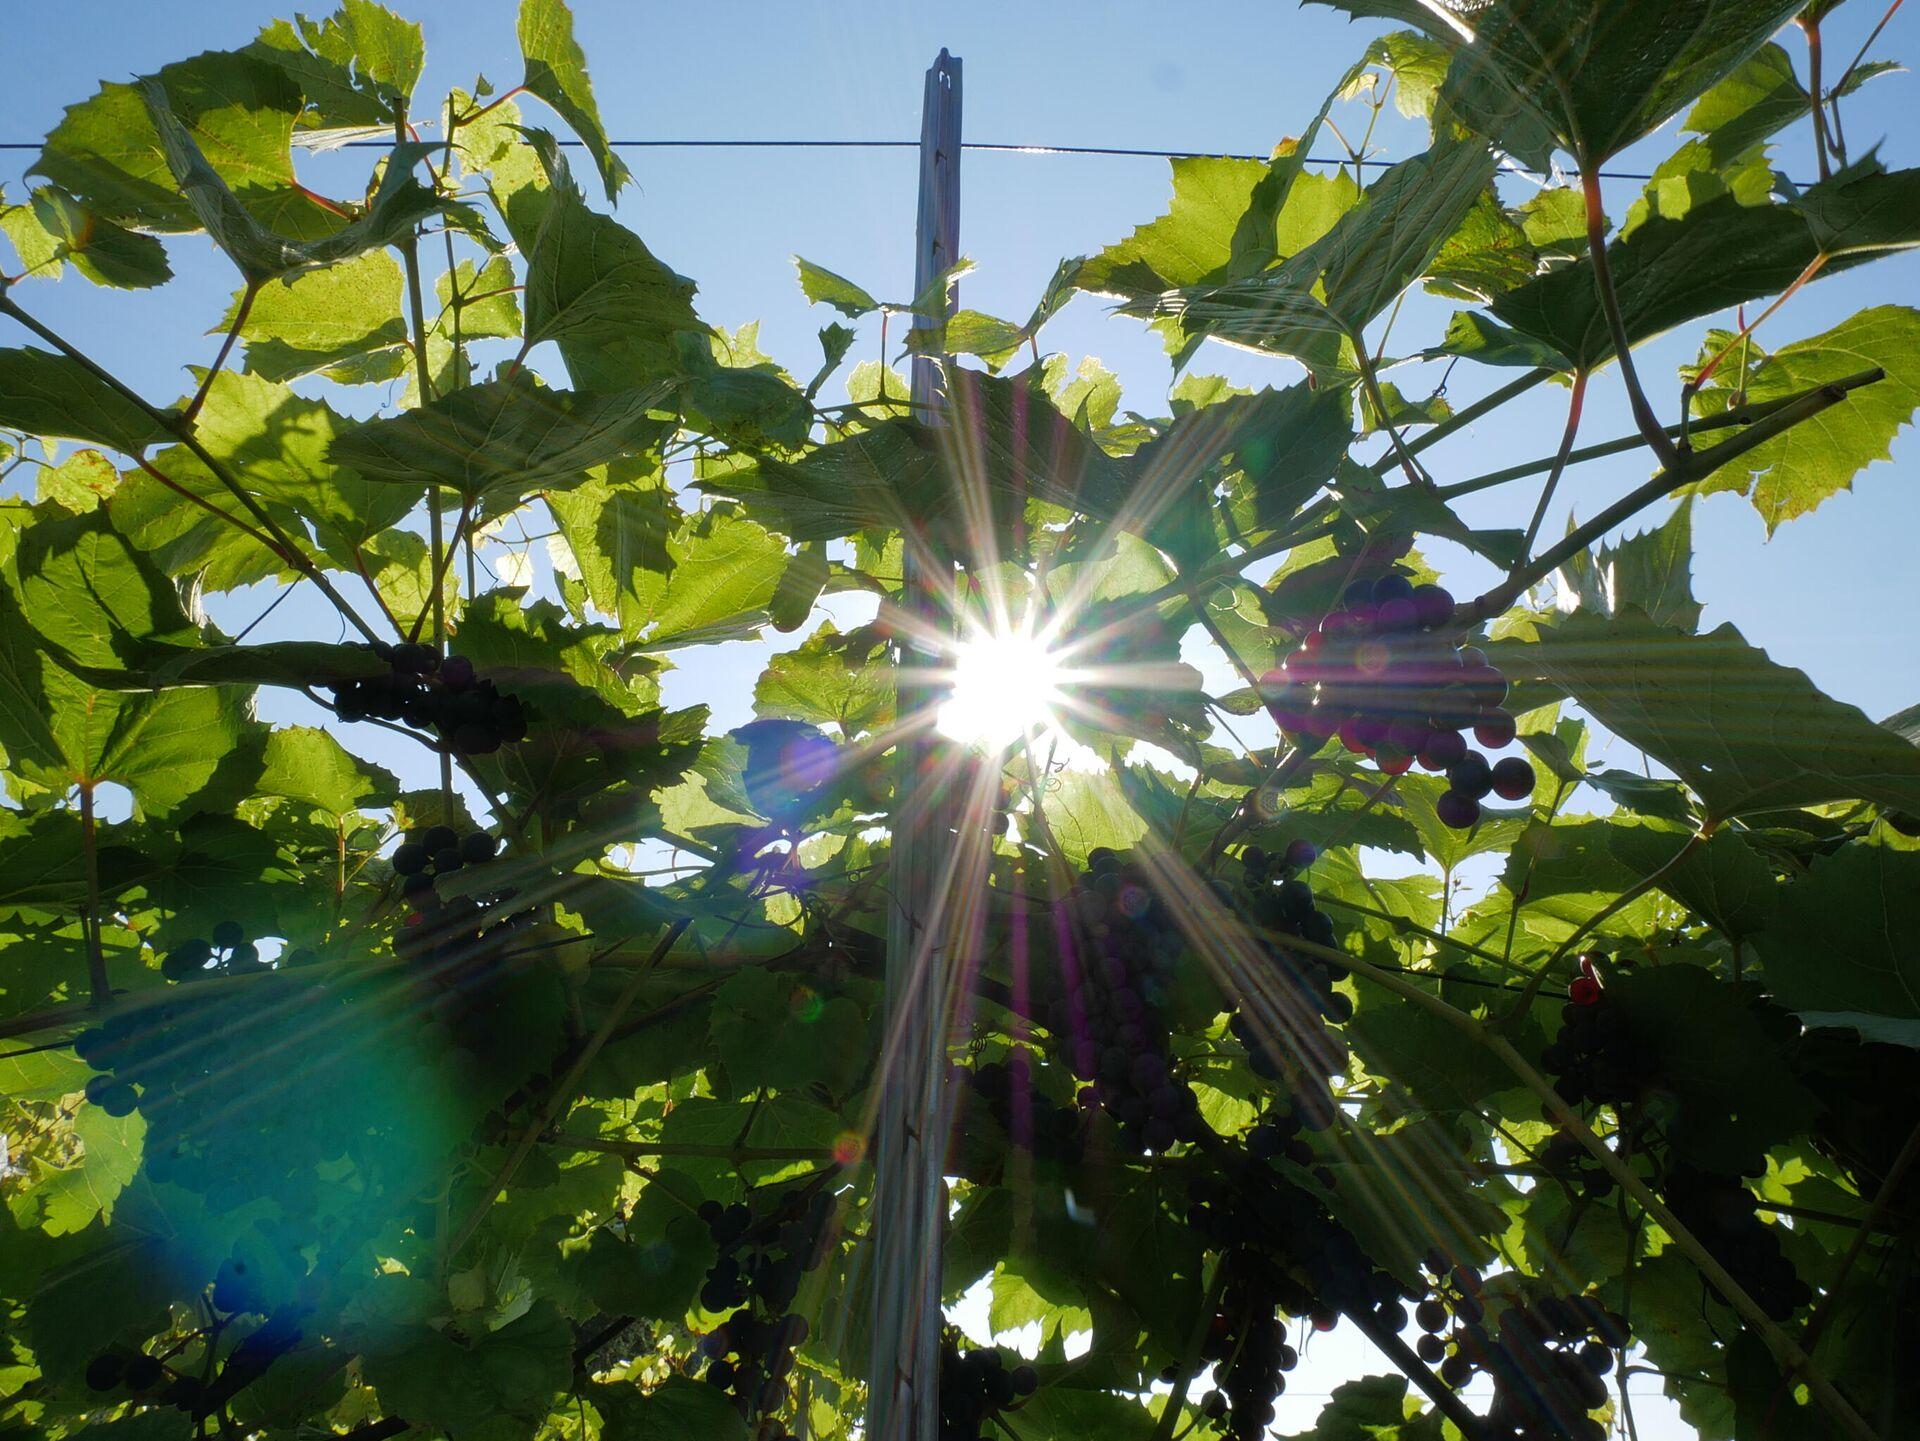 Выращивание винограда в Беларуси - Sputnik Беларусь, 1920, 16.09.2021